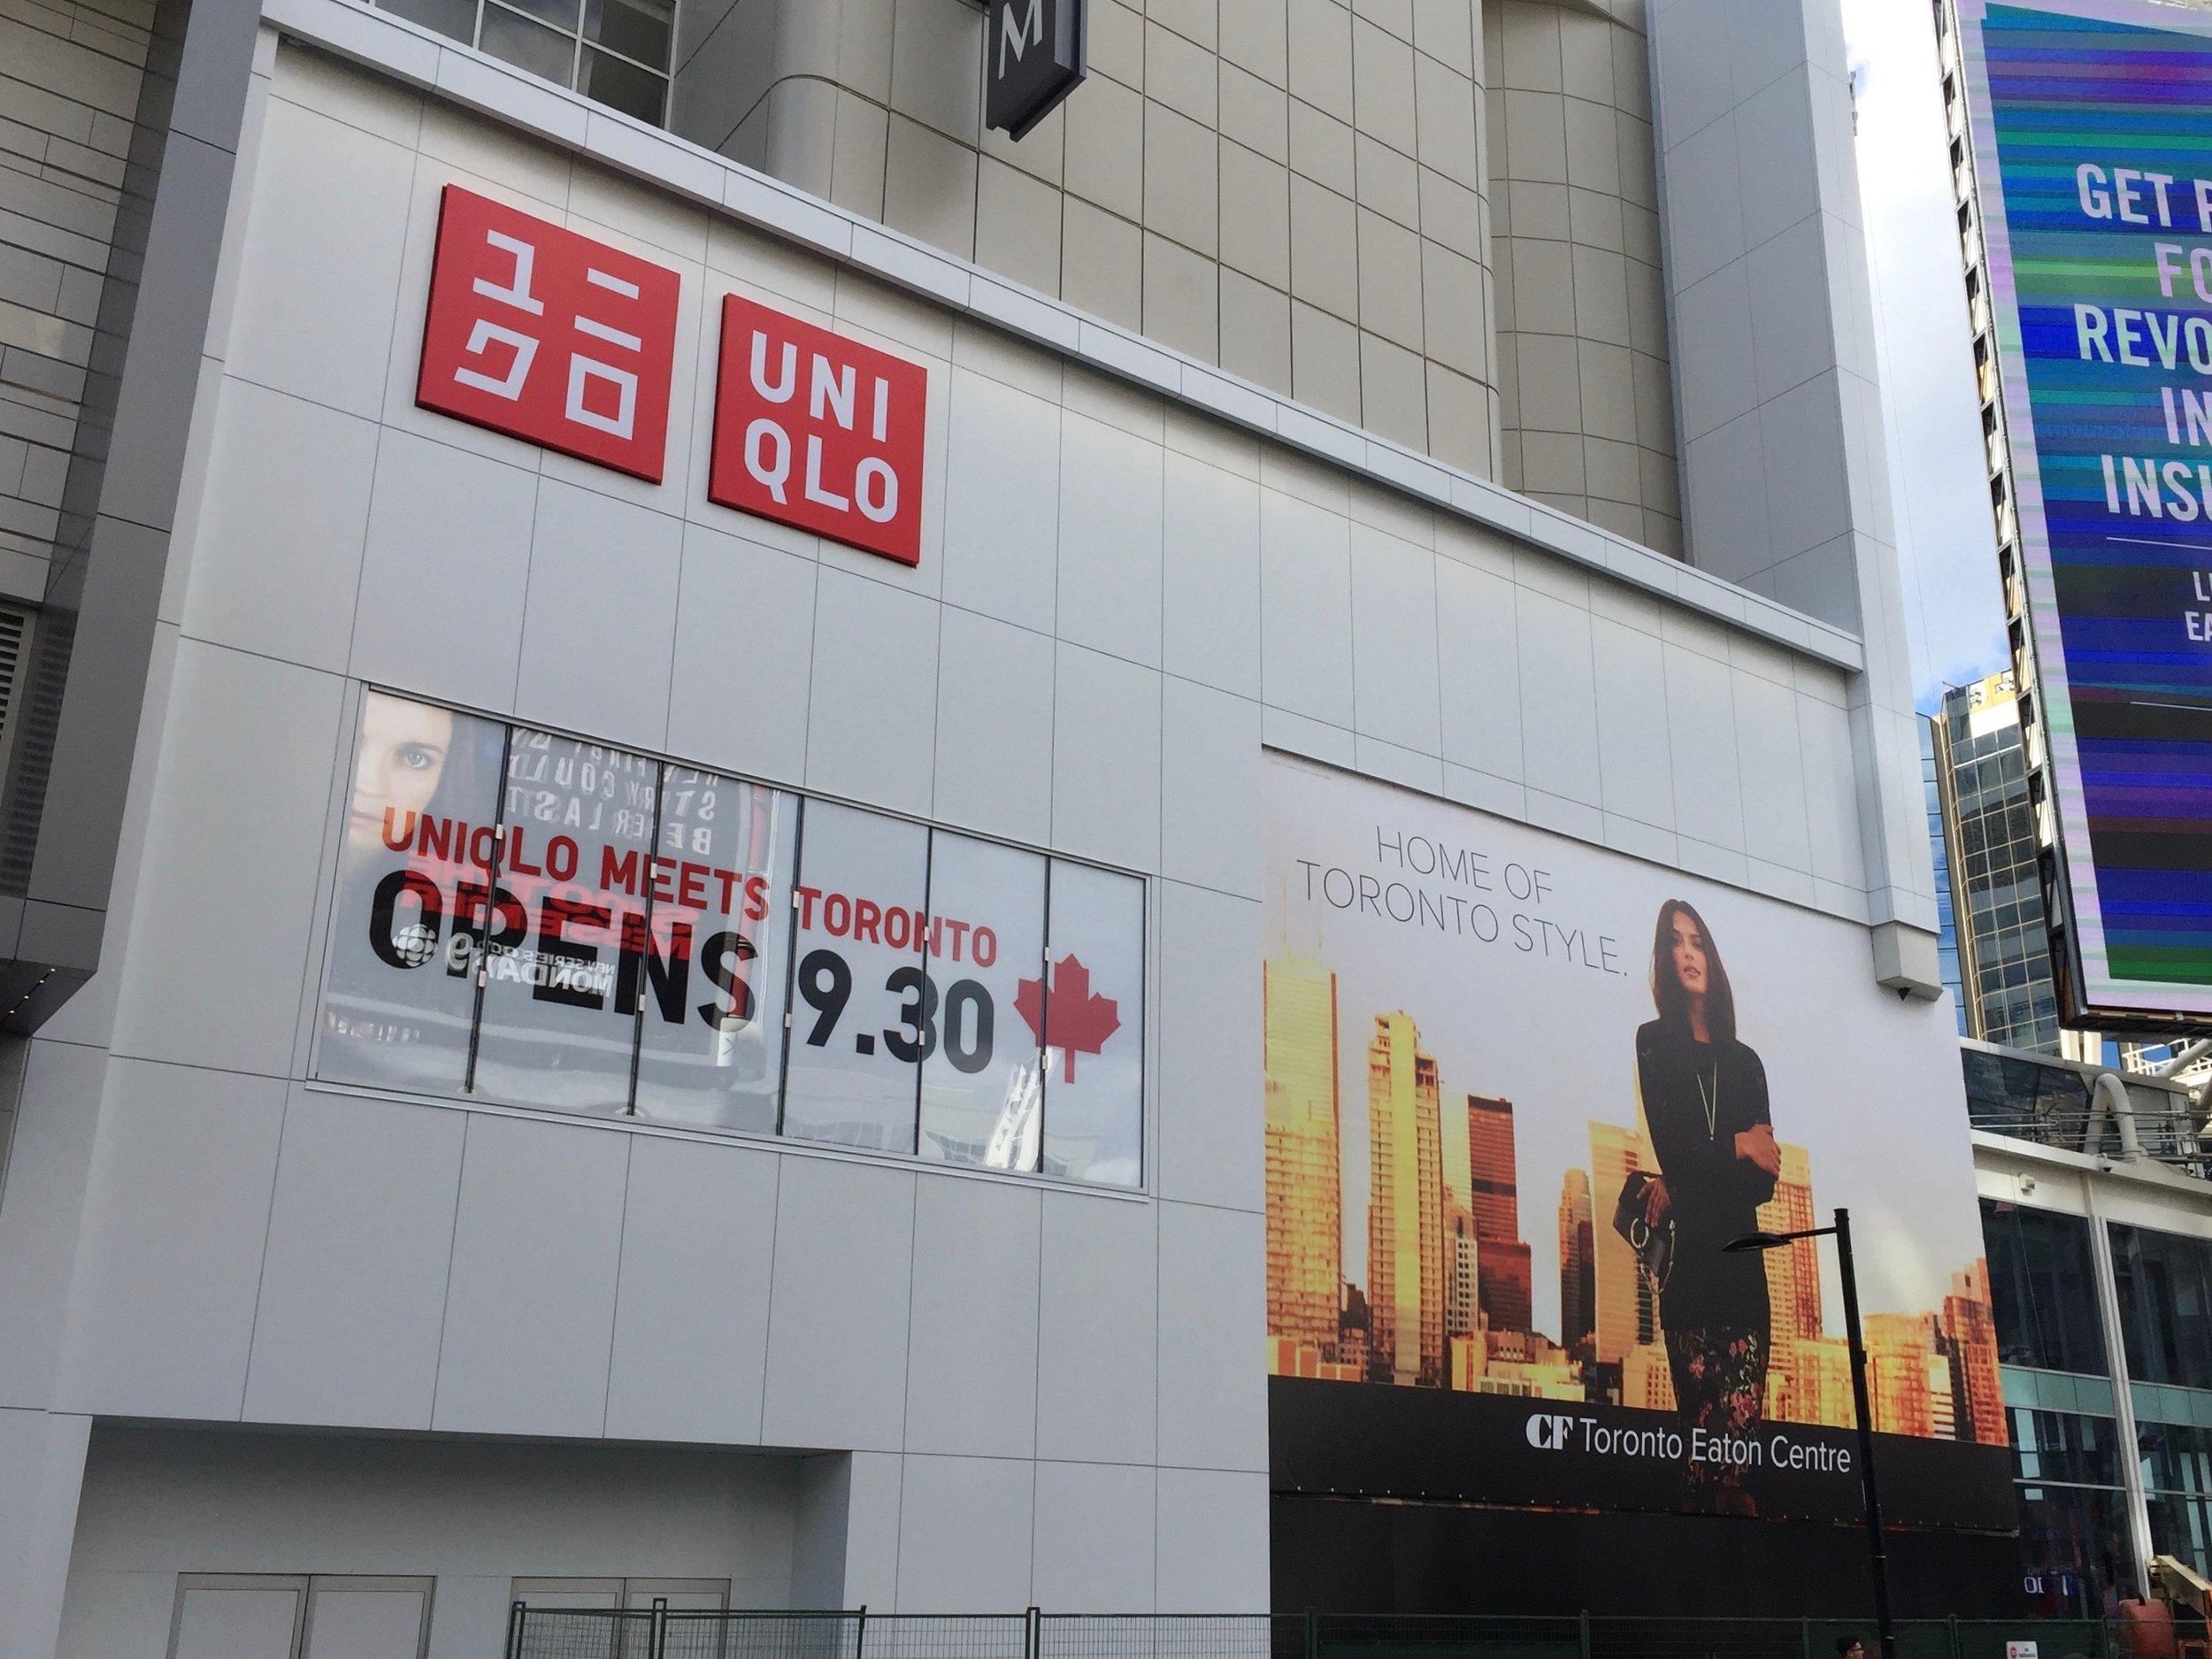 Exterior of Uniqlo Toronto, facing onto Yonge Street. Photo: Devon Johnson